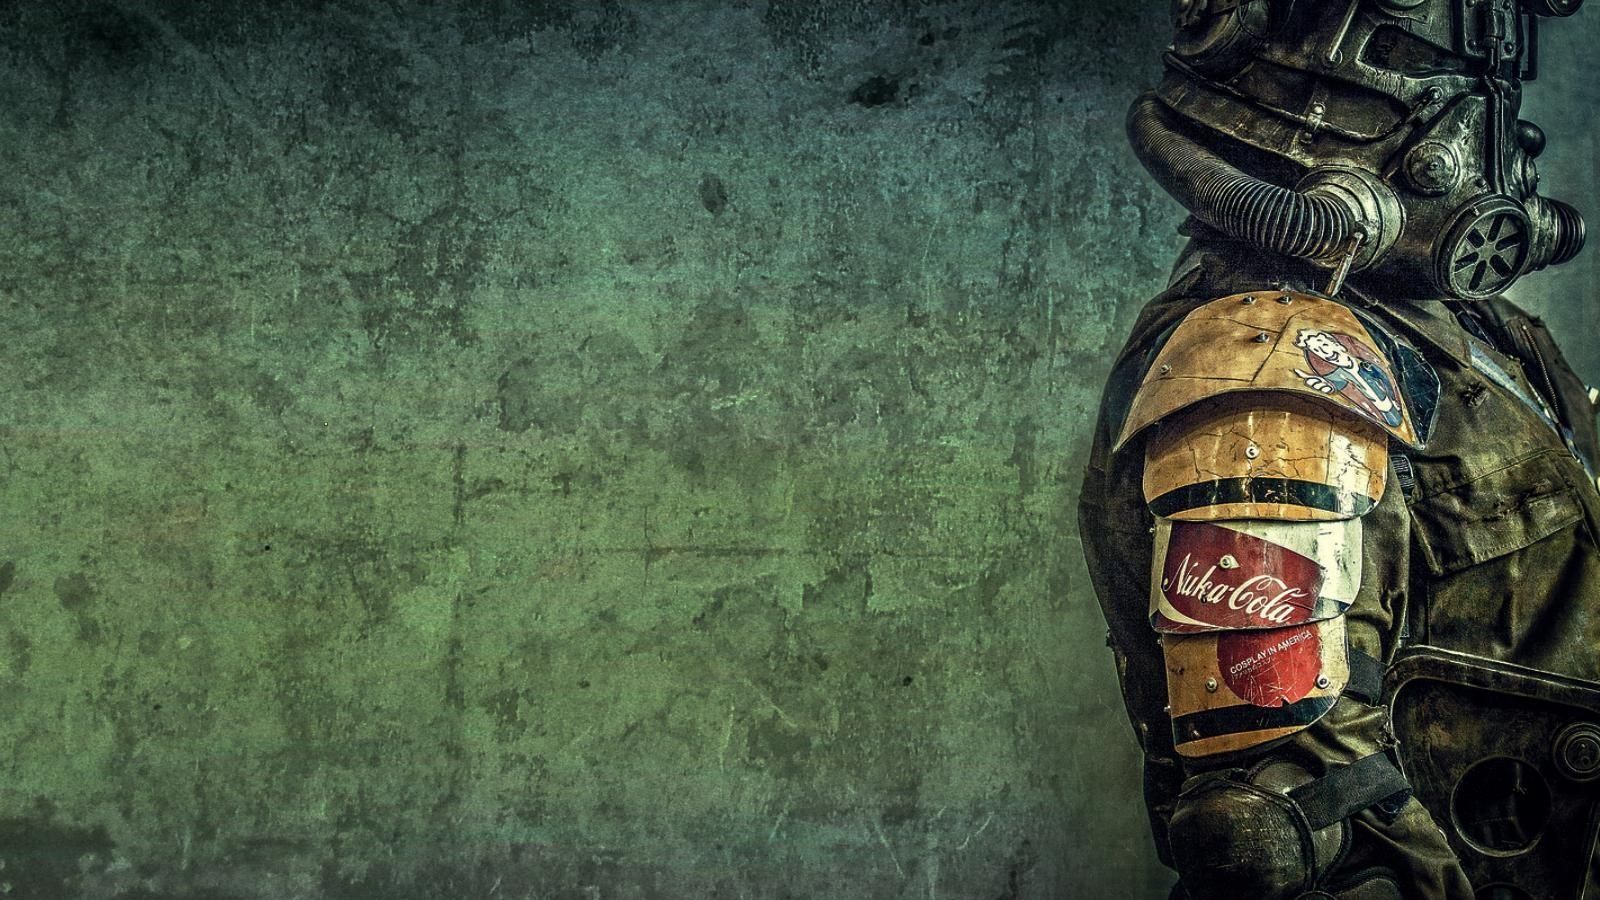 Wallpaper 1600x900 Px Brotherhood Of Steel Fallout Nuka